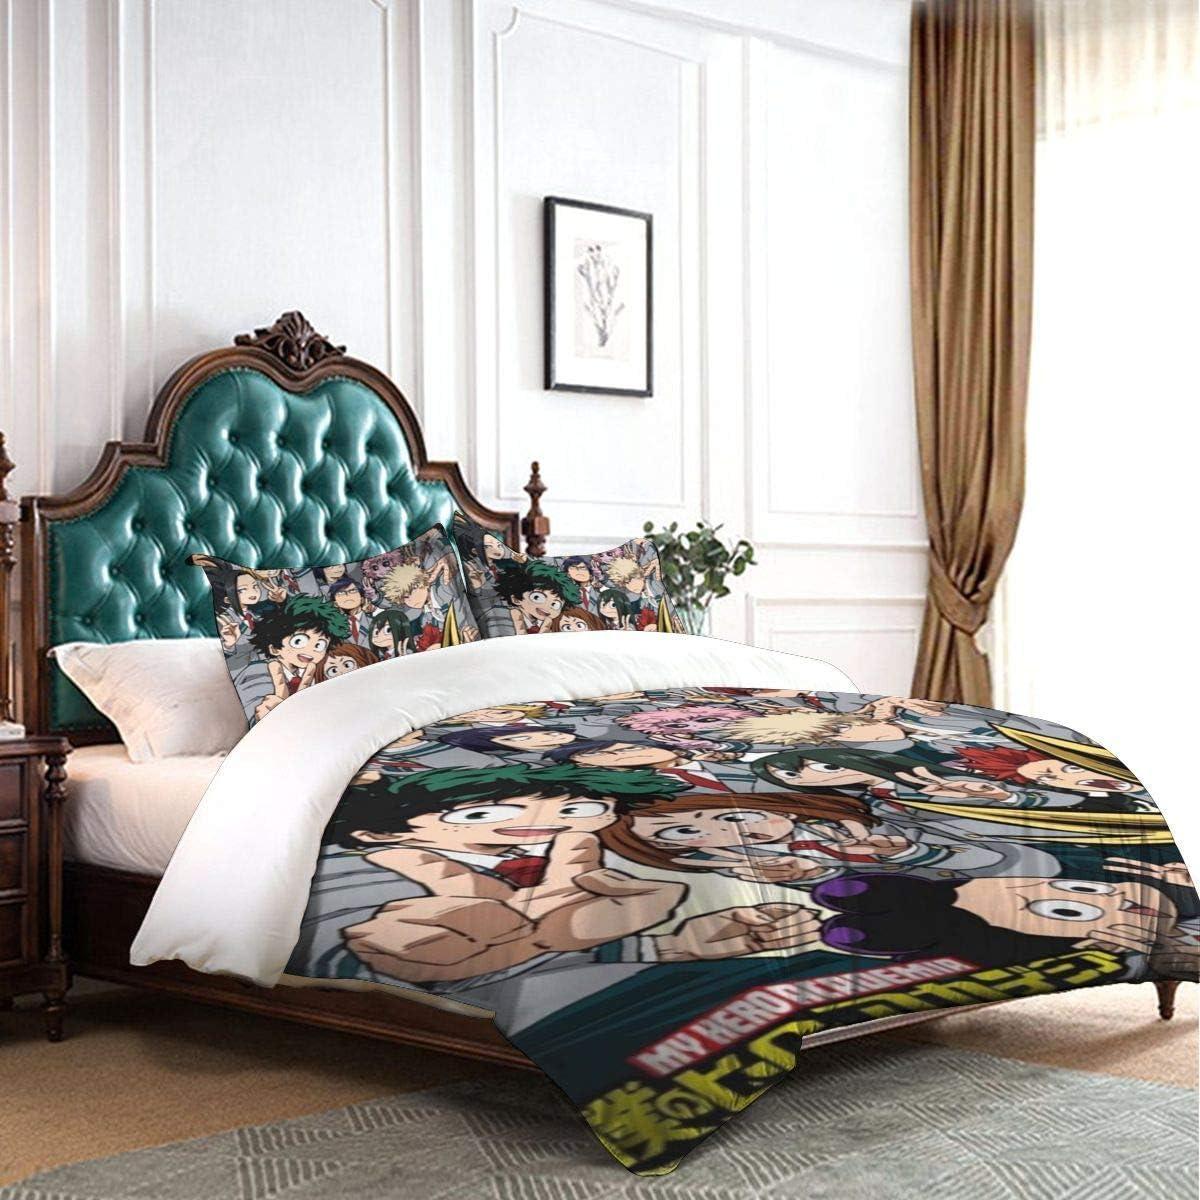 Superhero Design Bedding Set 3PCS Duvet Cover /& Pillowcases Comforter Cover Set